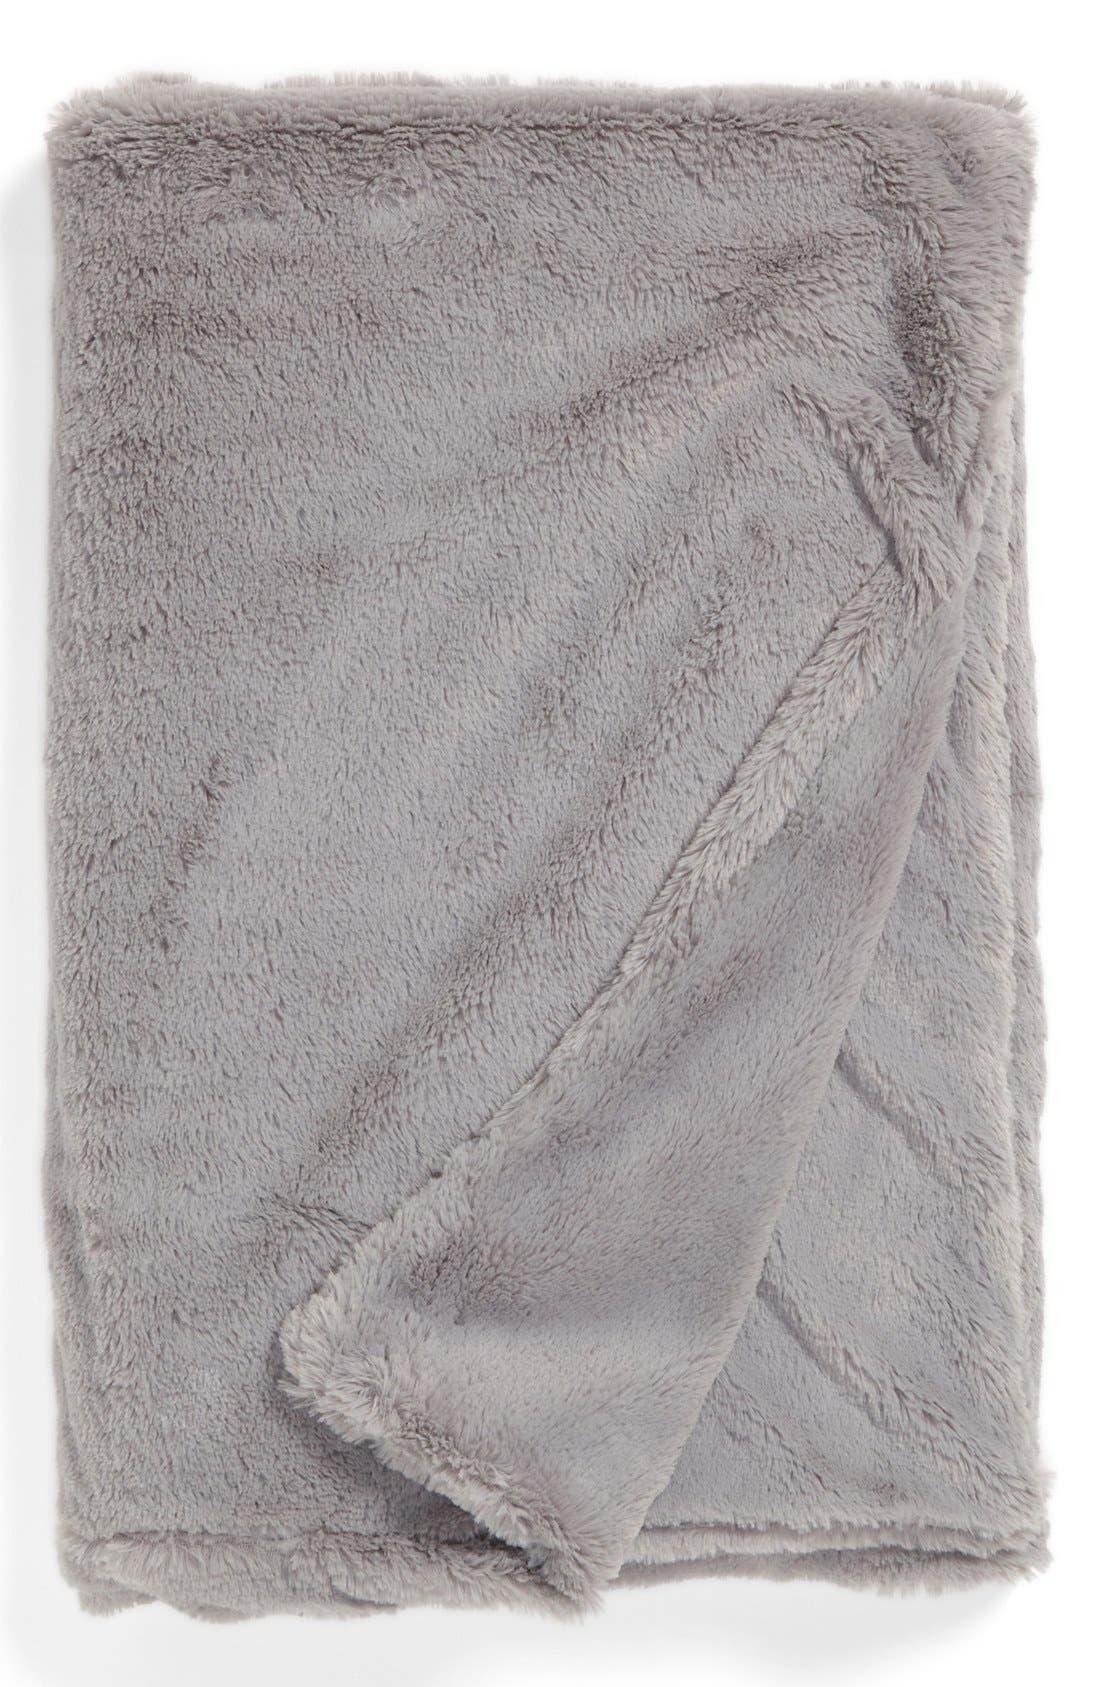 Main Image - Inphant Elefant 'Silky' Throw Blanket